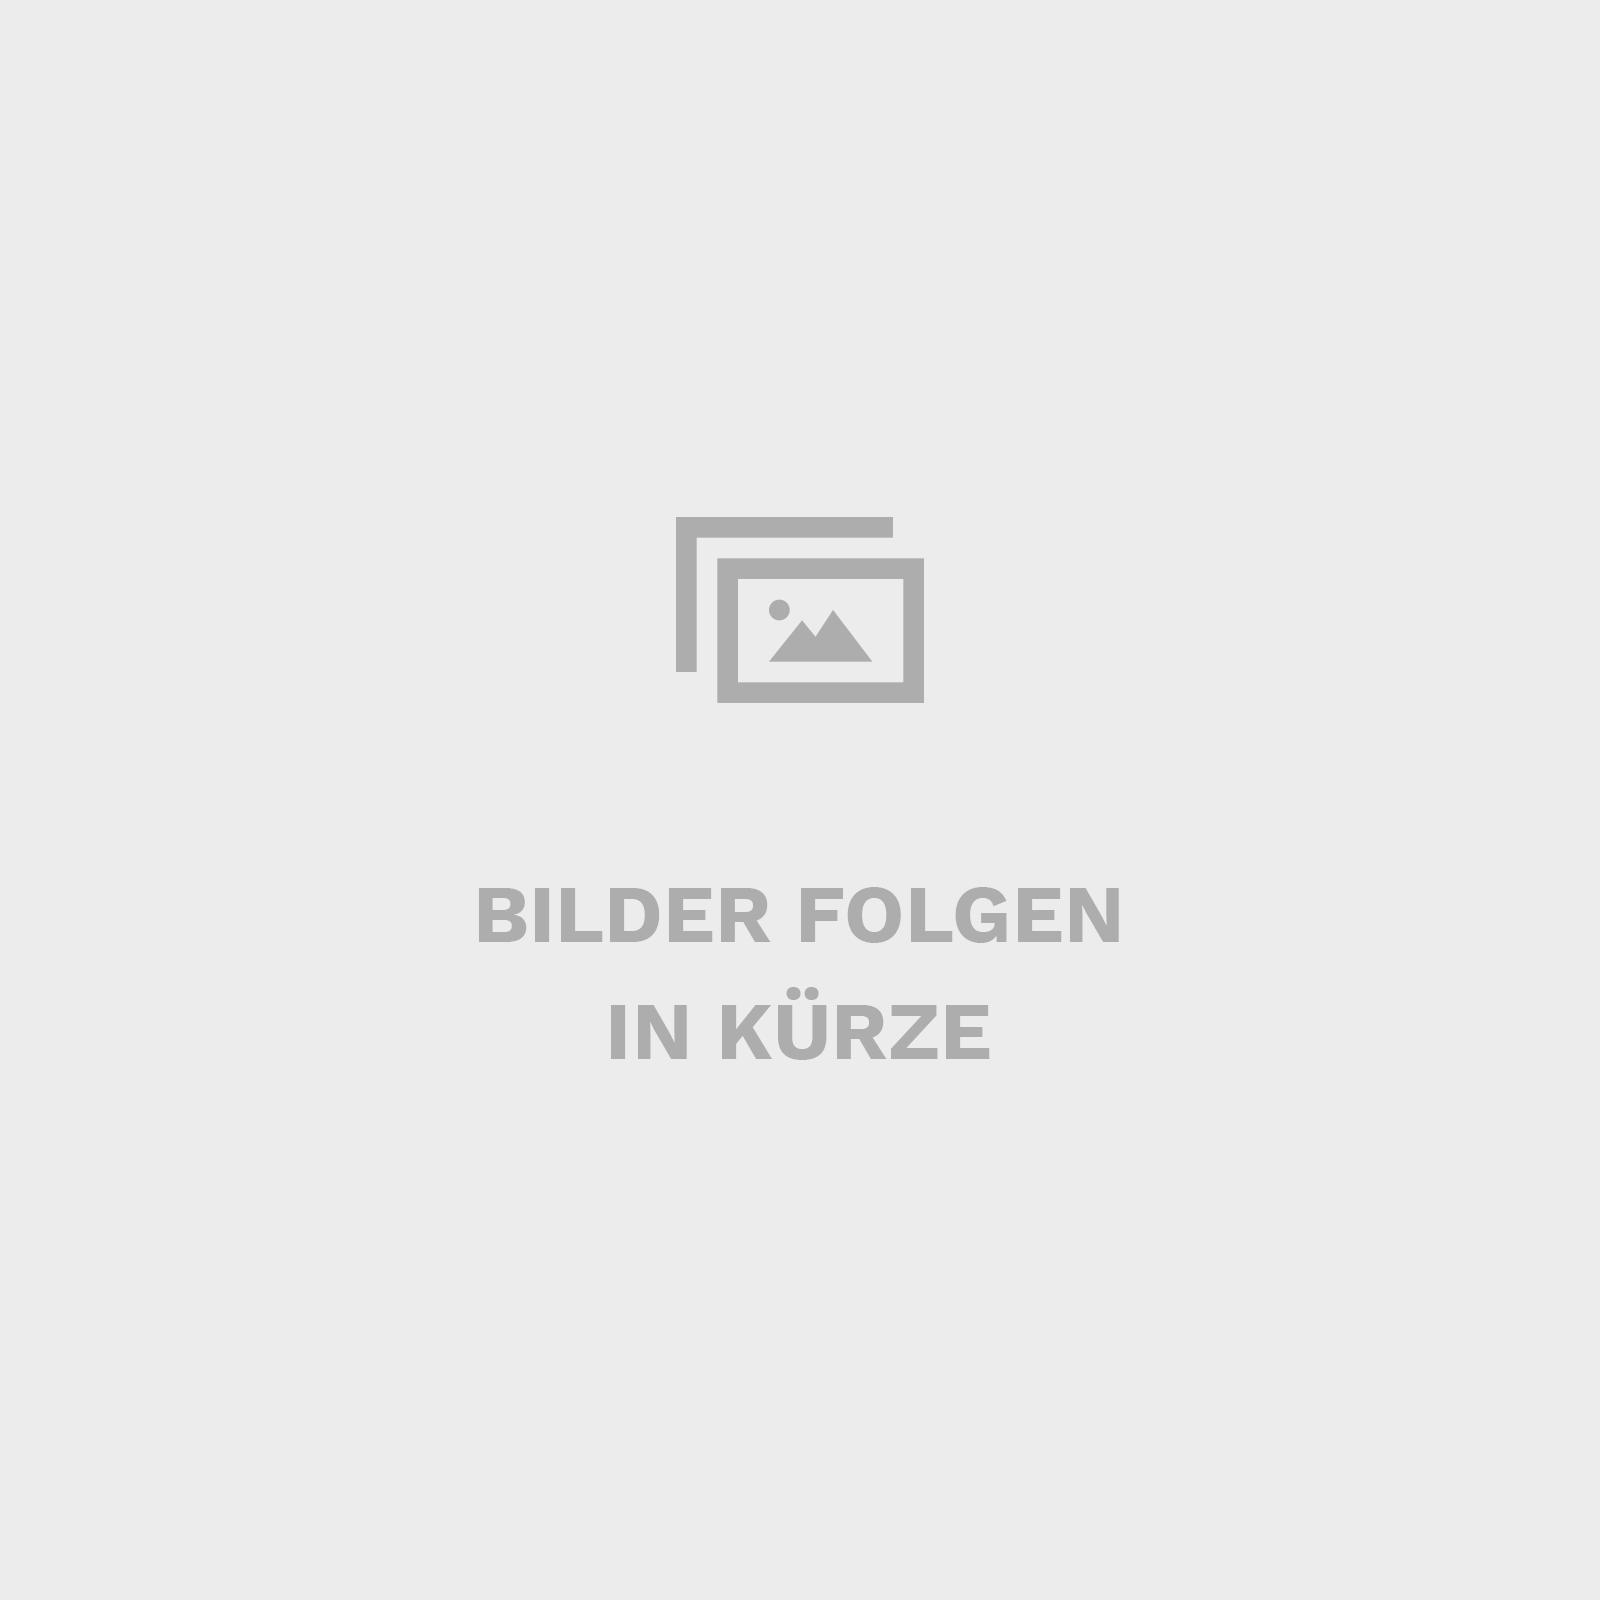 Kvadrat Rugs - Duotone - Farbe 0982 - Detailansicht